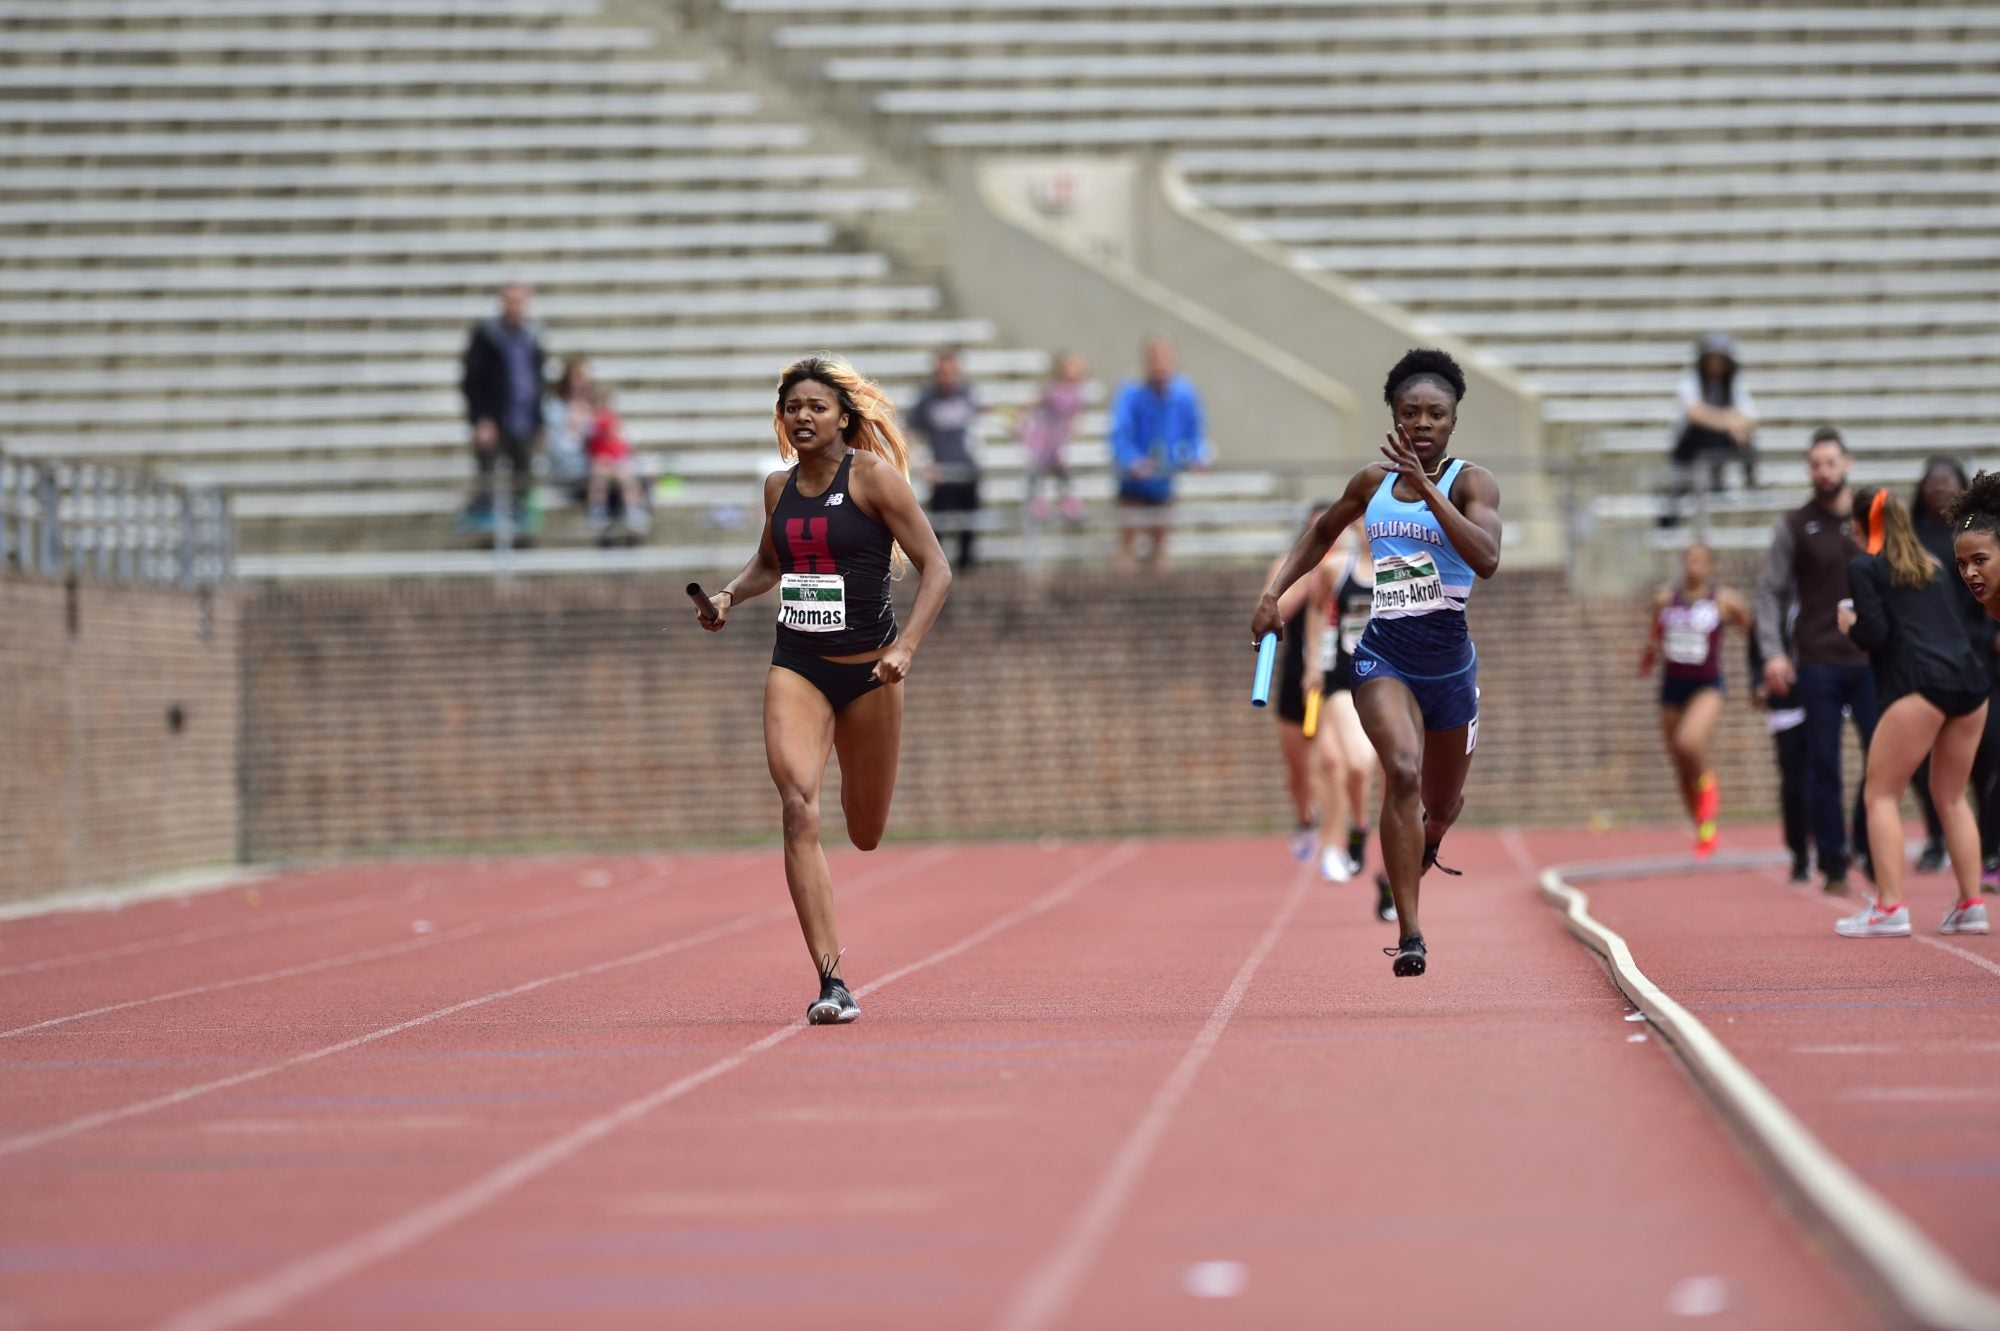 Harvard students running on a track